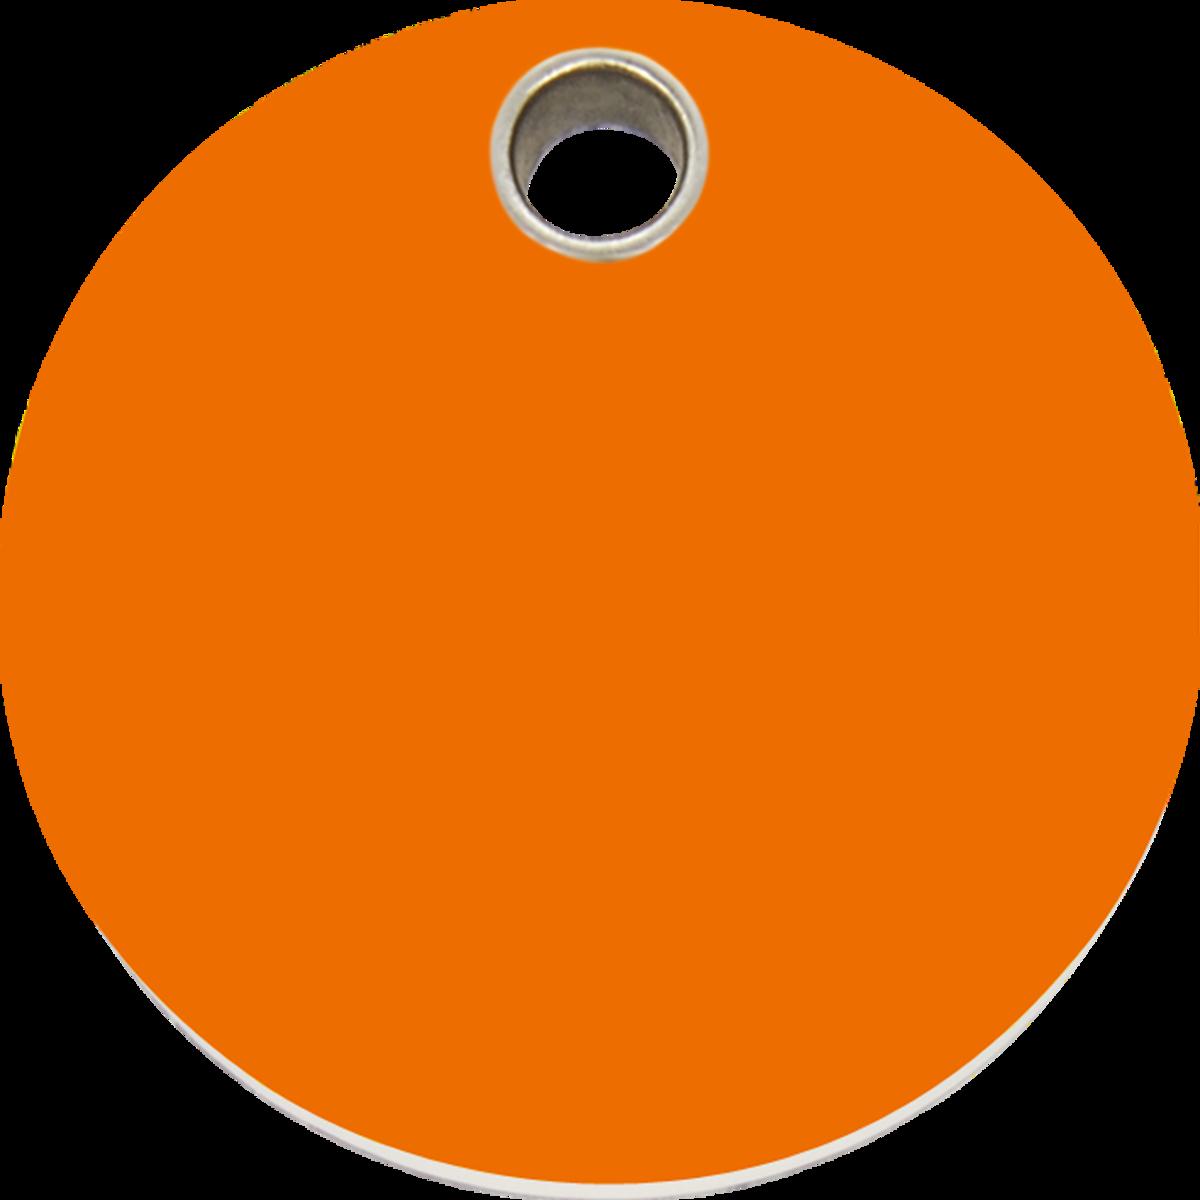 Red Dingo Plastic Circle Pet ID Tag